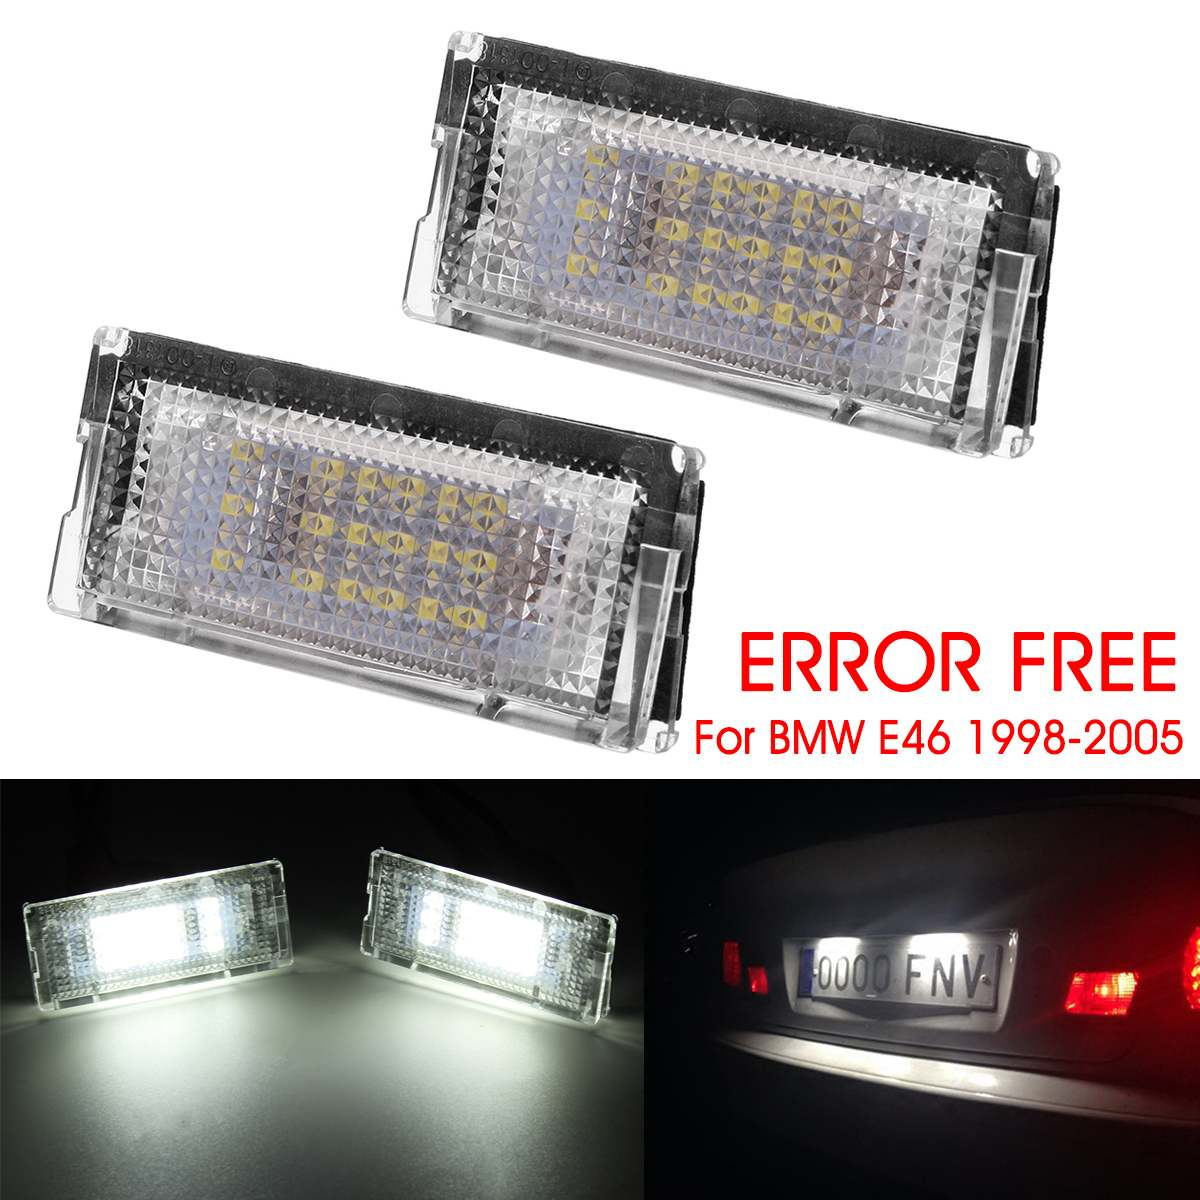 LED License Number Plate Light Lamp Bulb BMW 3 Series E46 2003-06 Canbus White